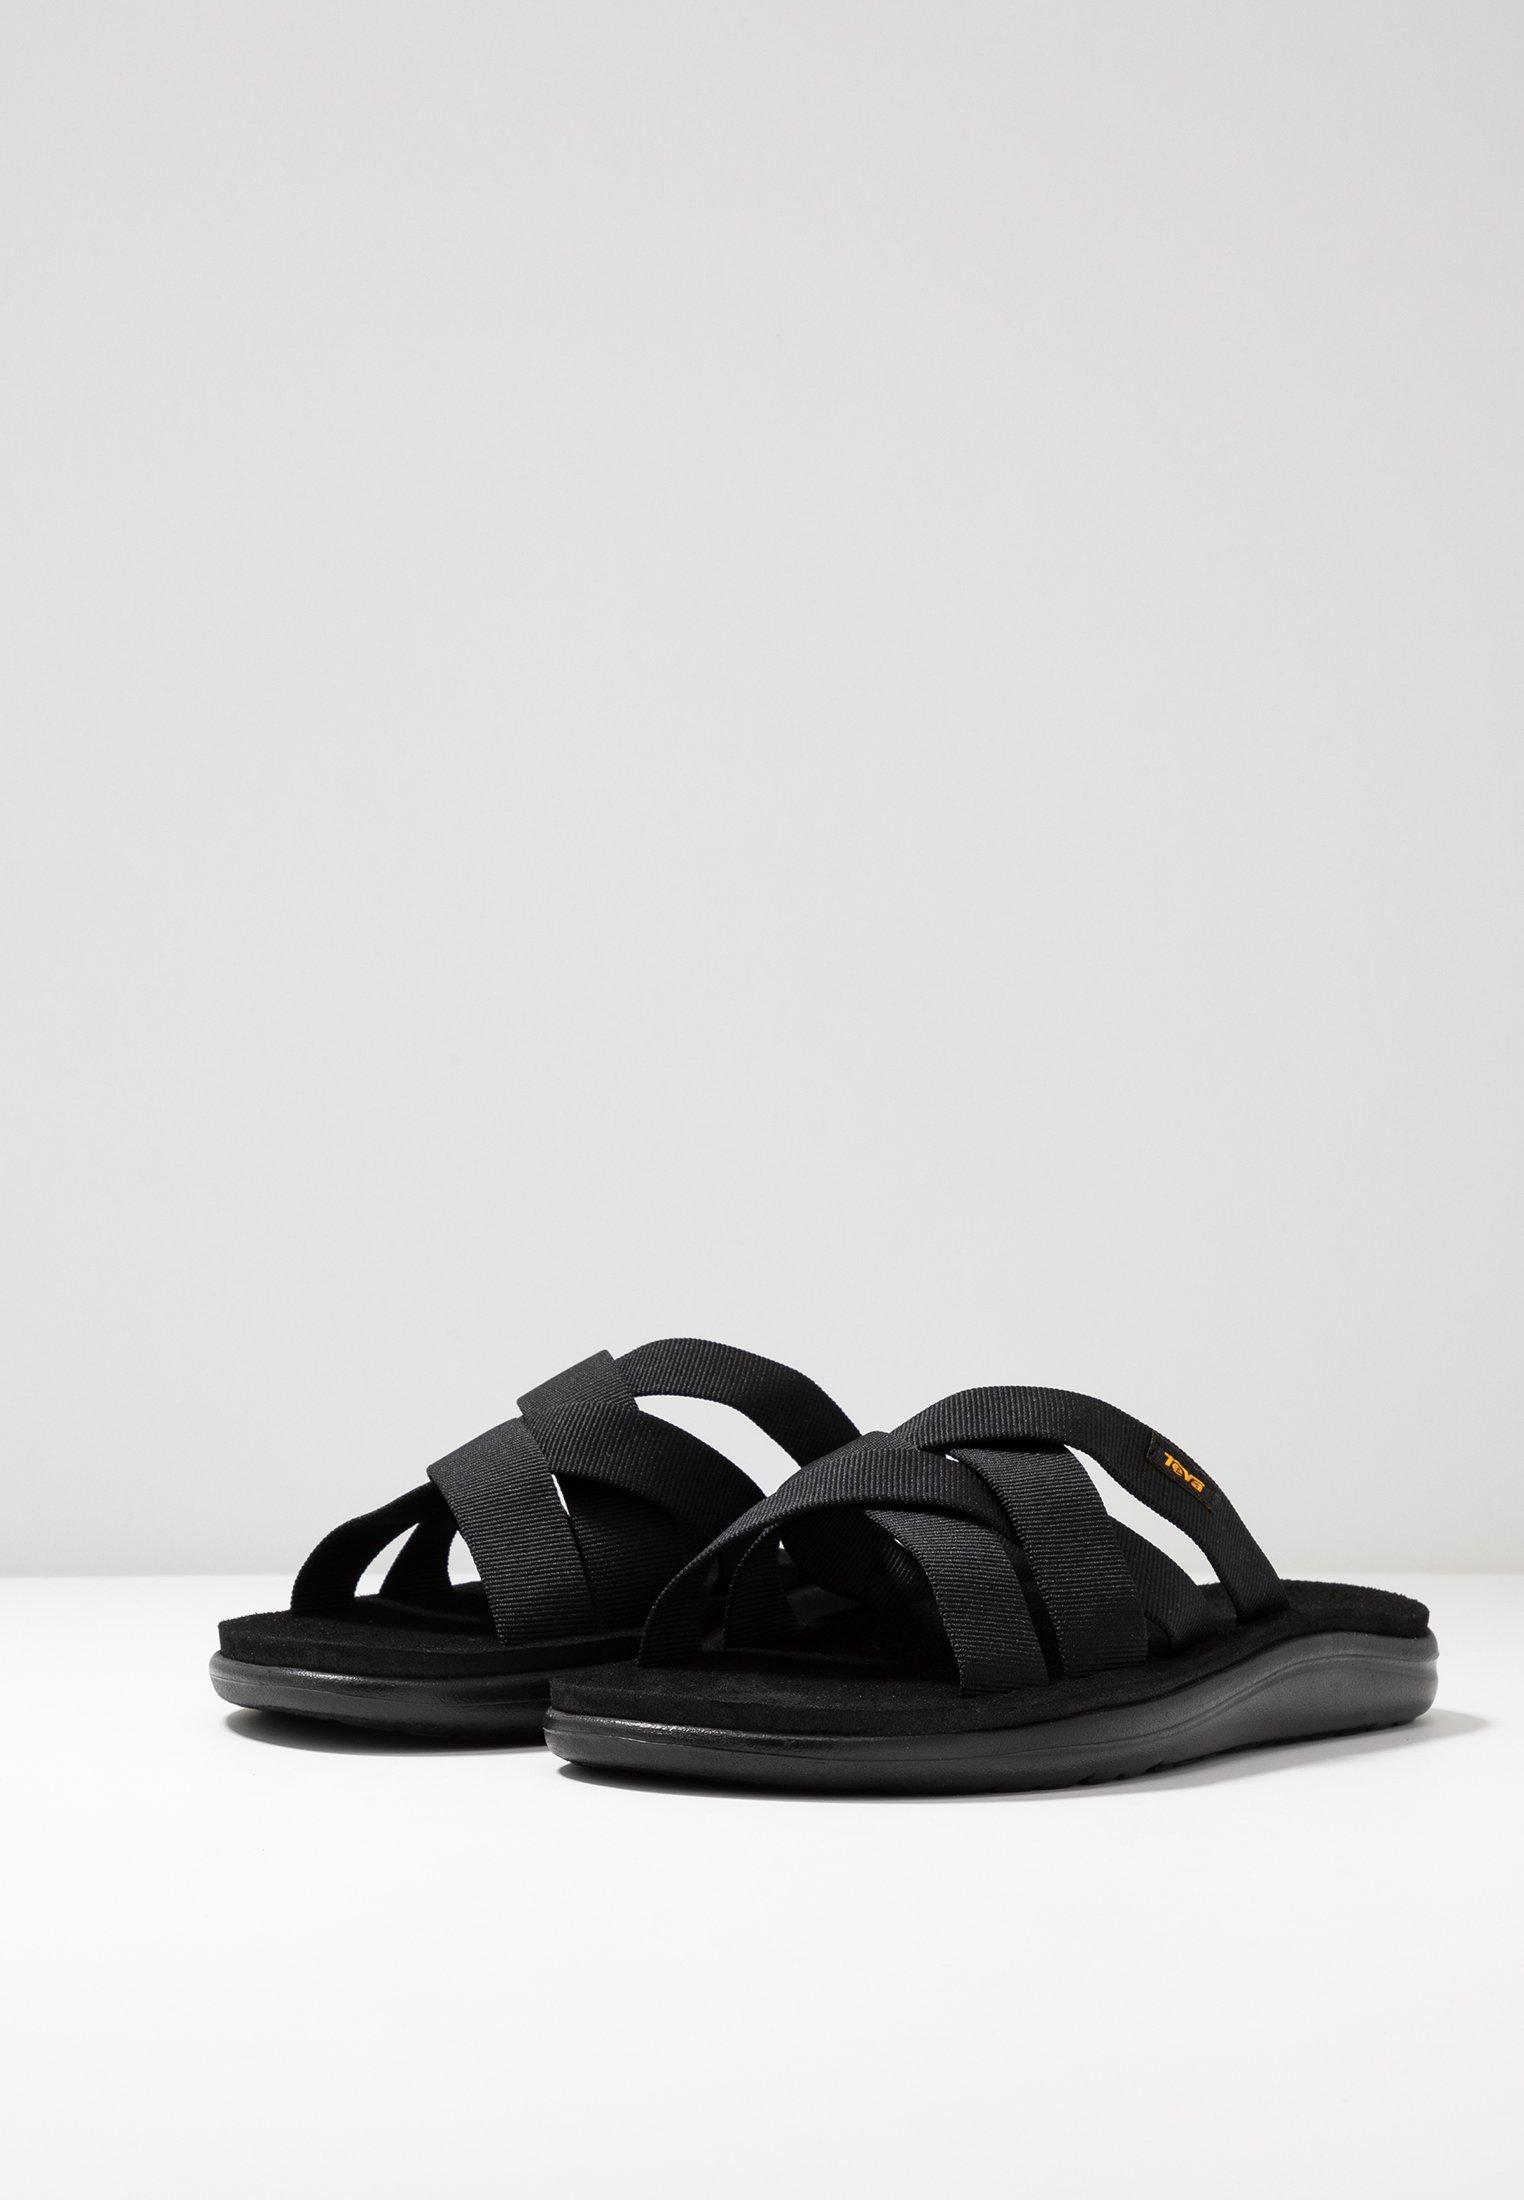 Teva VOYA SLIDE - Sandales de randonnée black